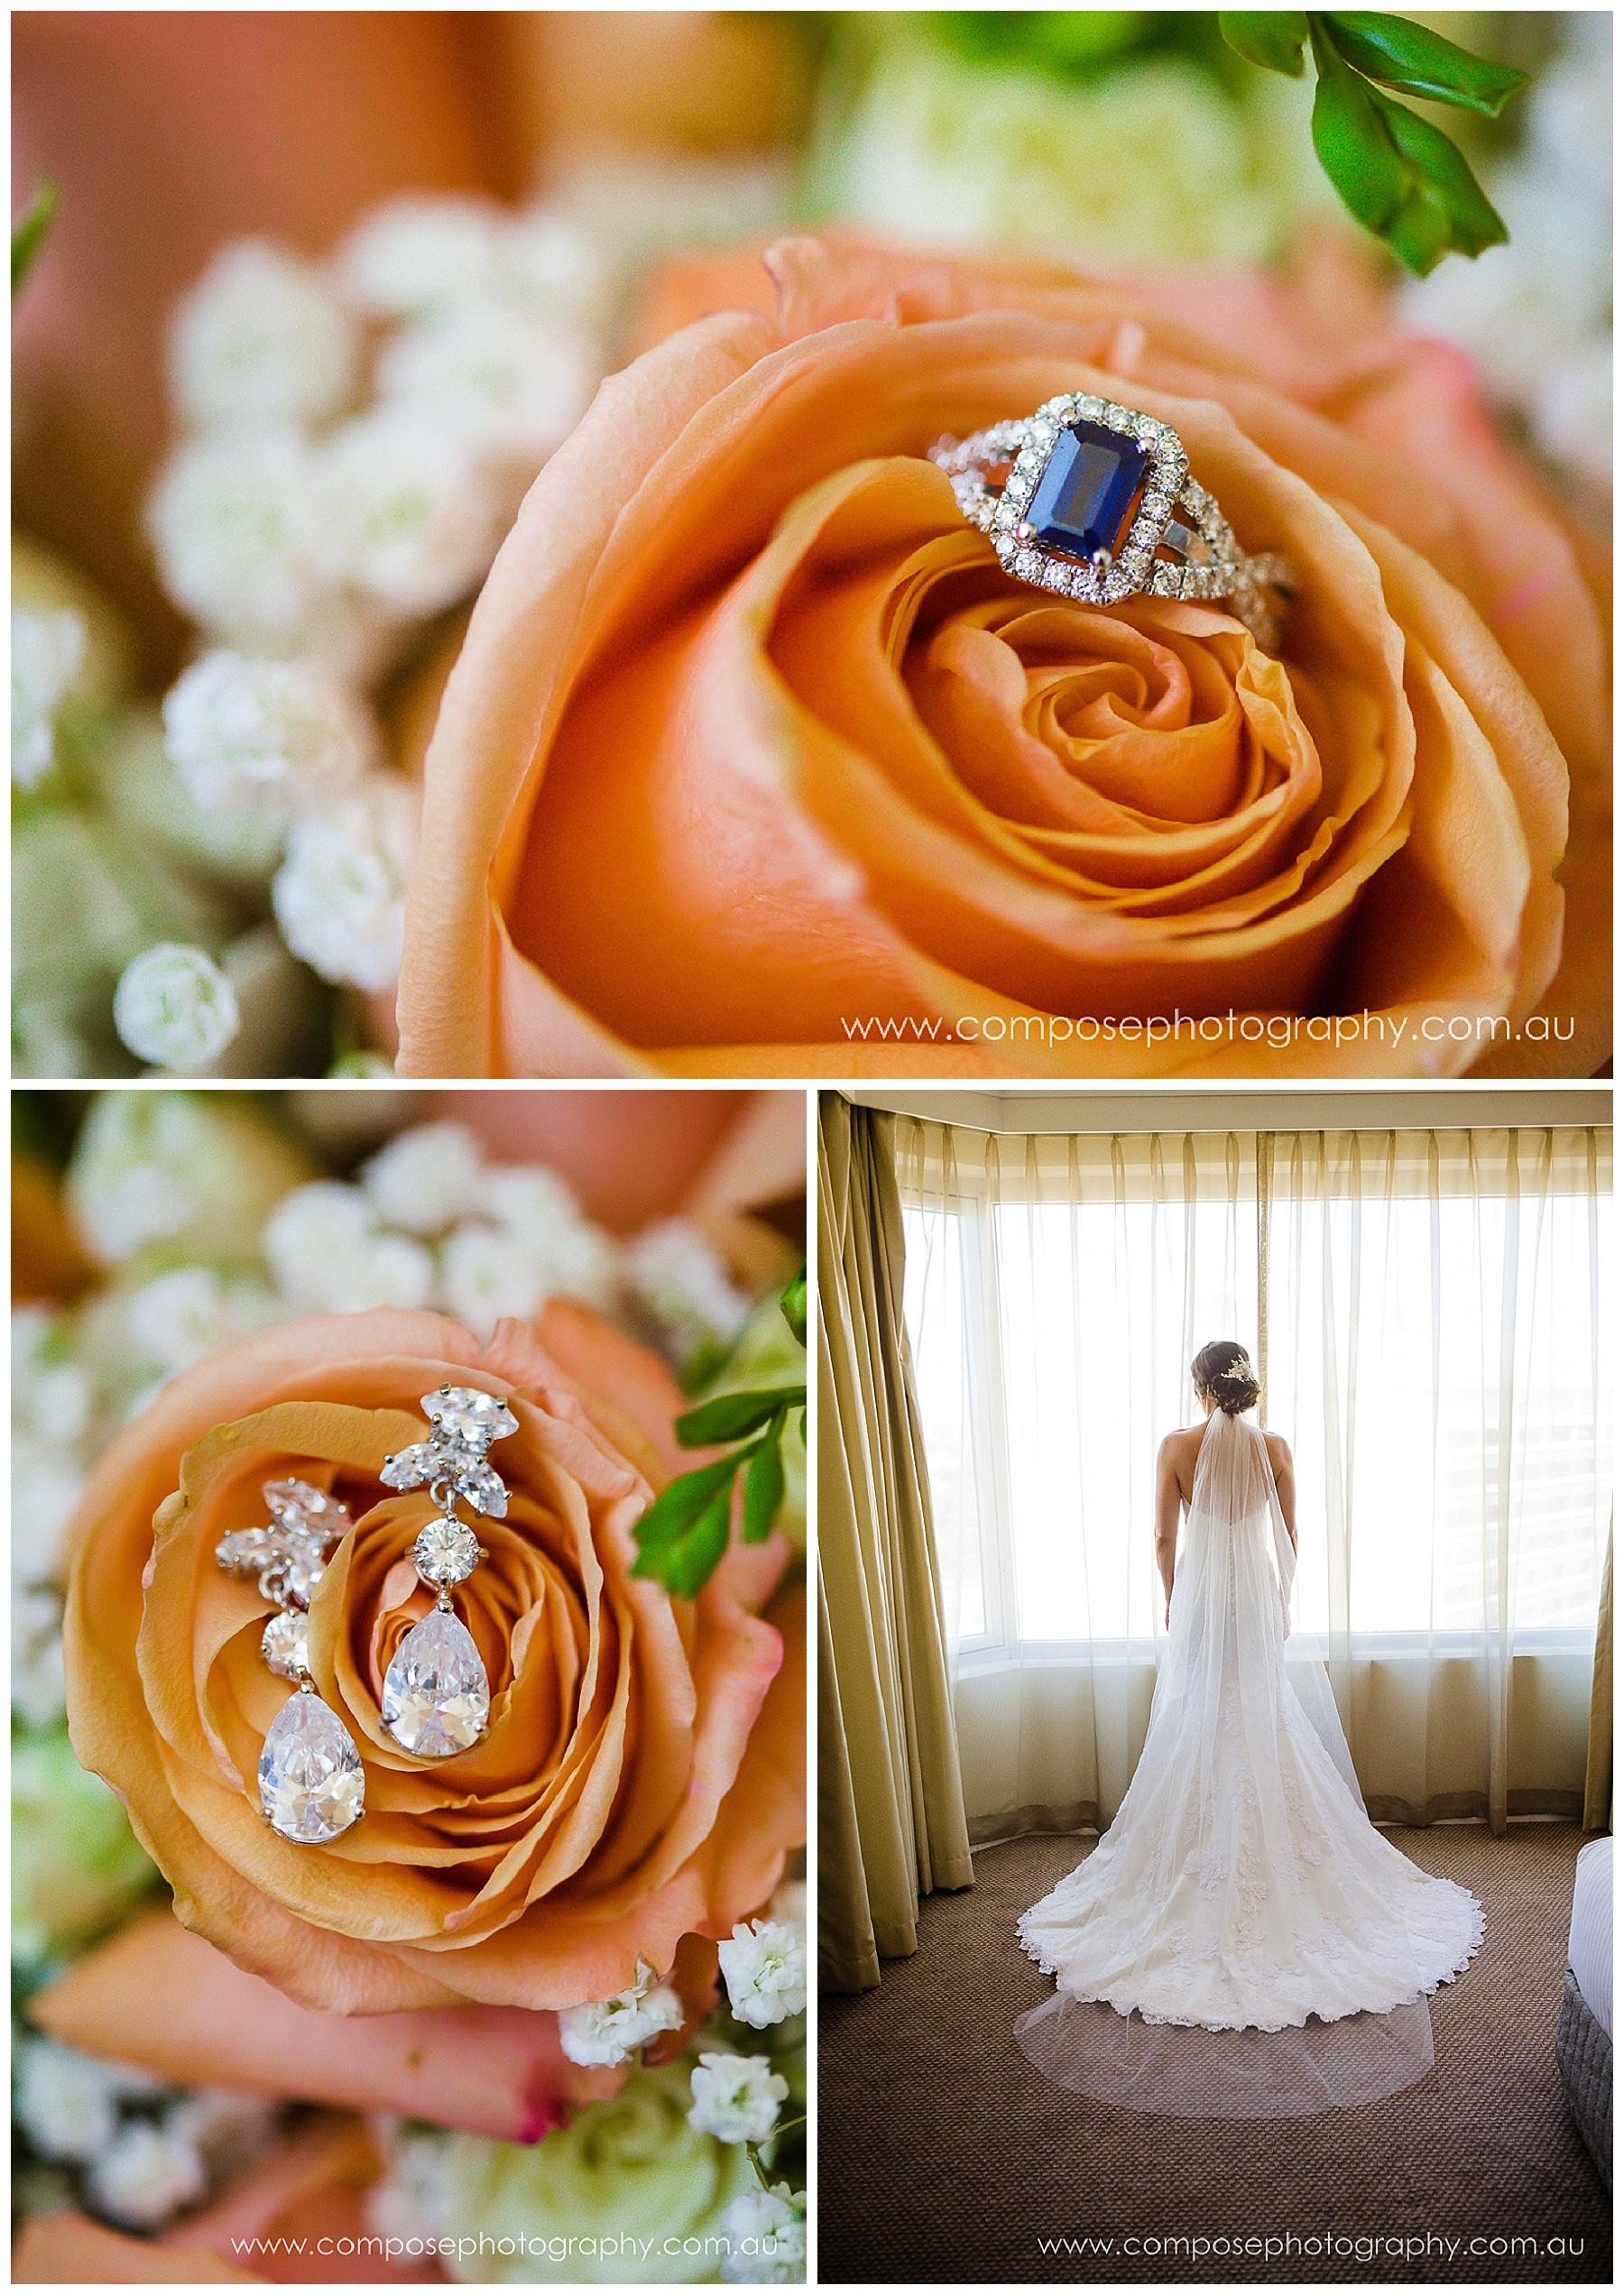 sapphire engagement ring perth